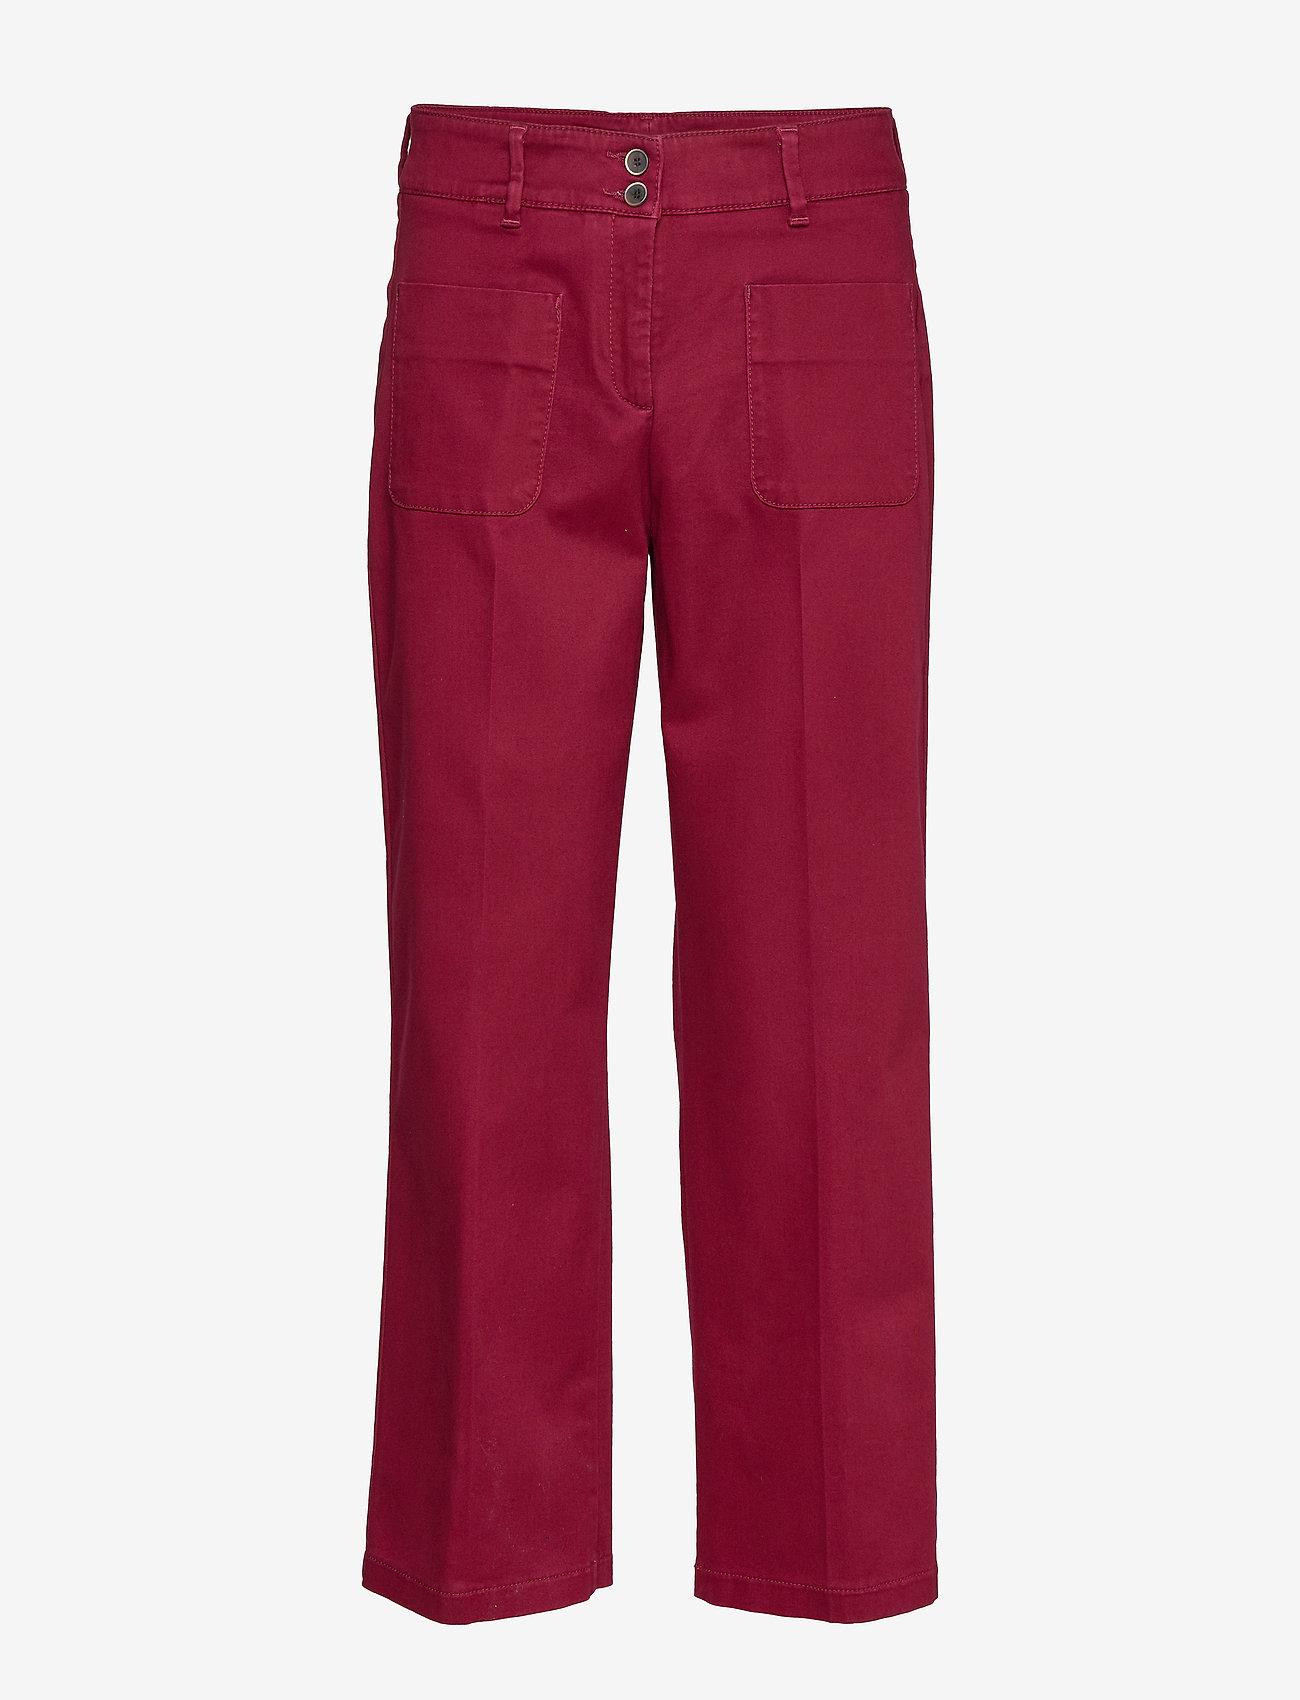 BRAX - MAINE S - wide leg trousers - cranberry - 0